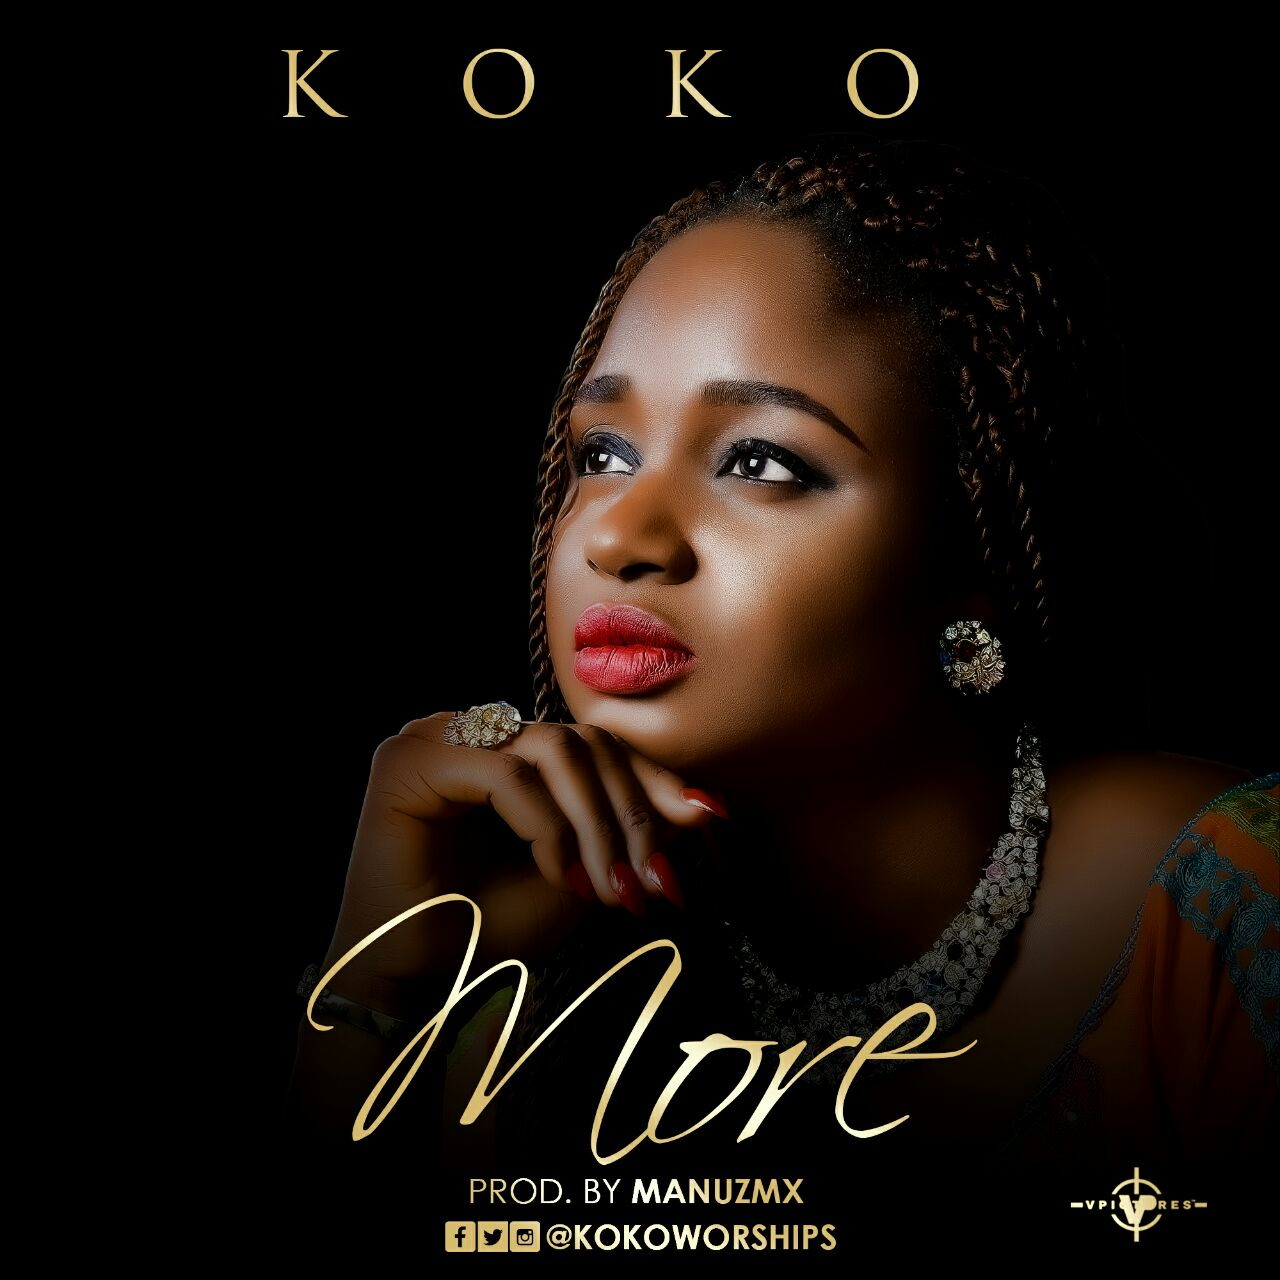 DOWNLOAD Music: Koko – More (Prod. By ManuzMx)